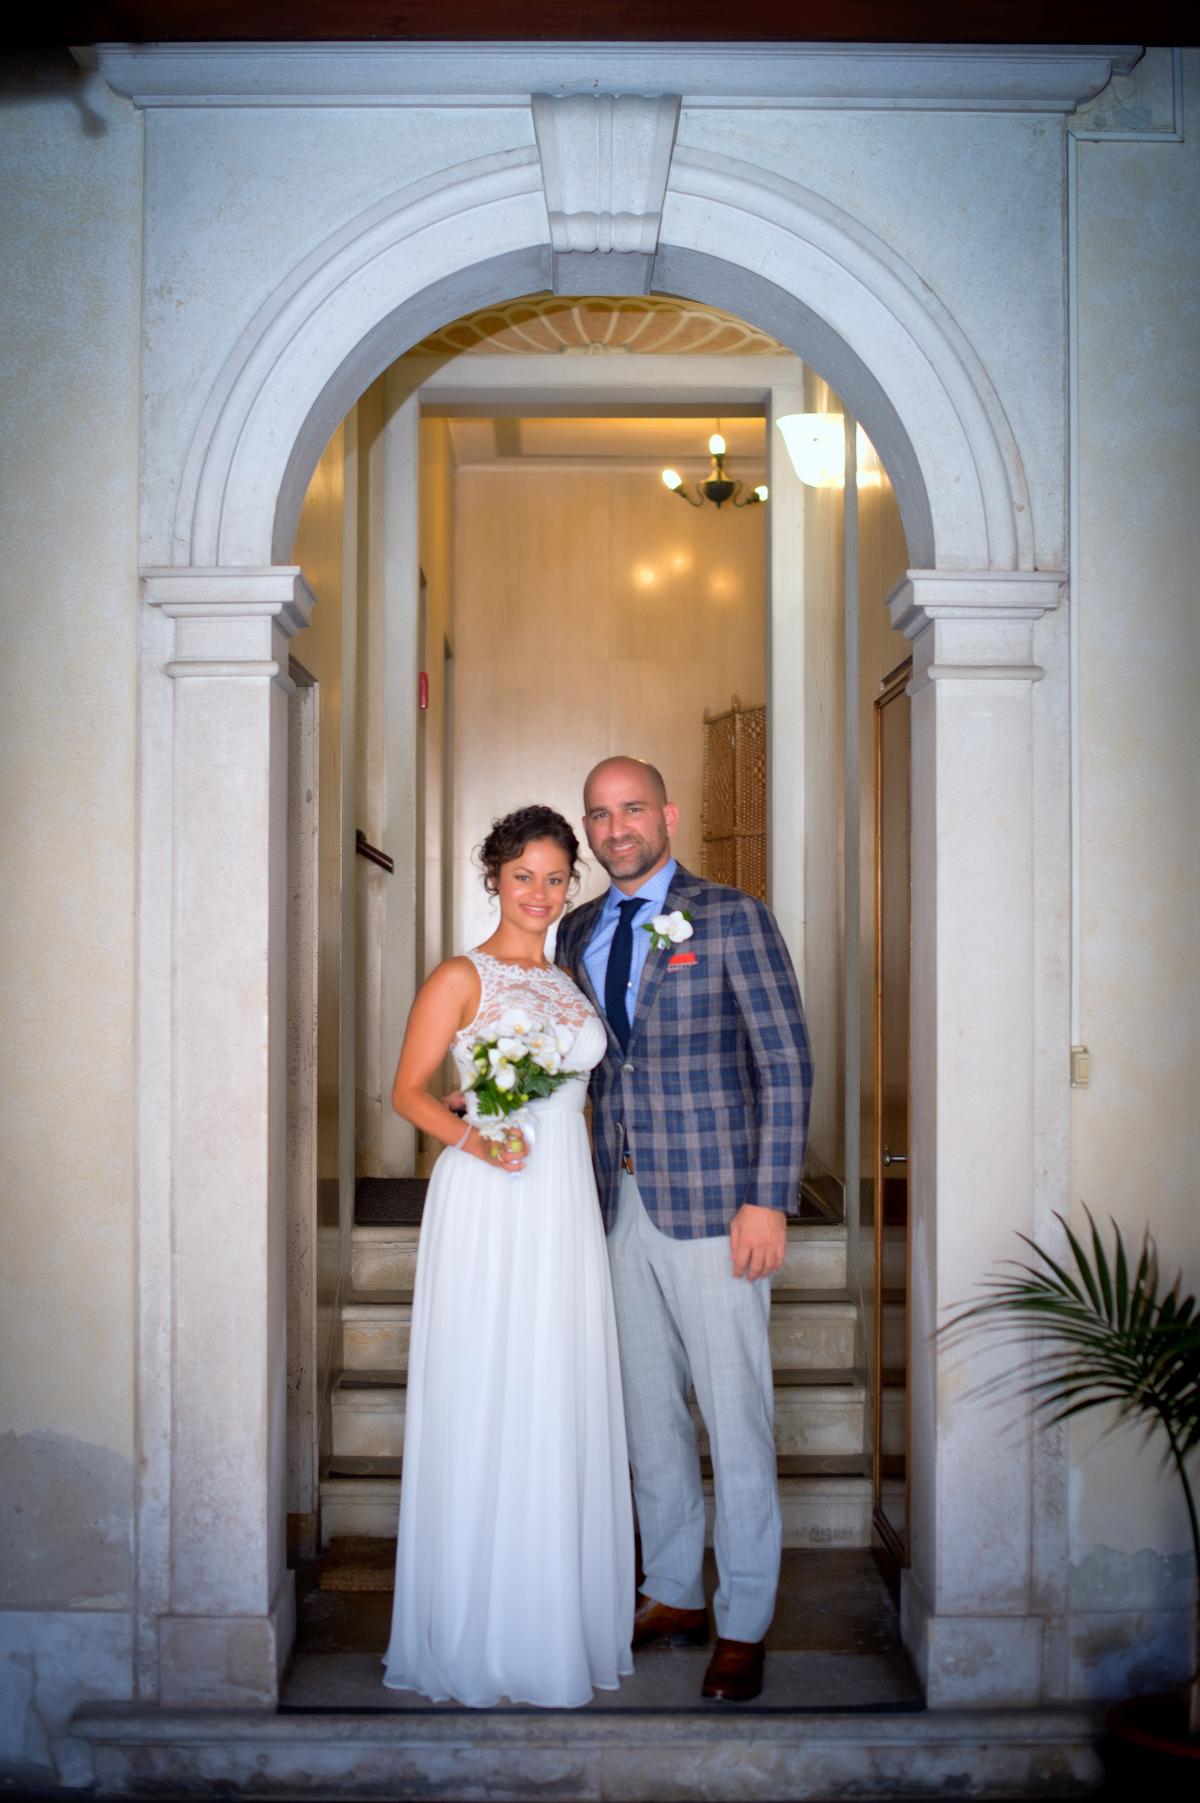 mariage venise photographe palazzo cavalli venice wedding photographer (33).jpg